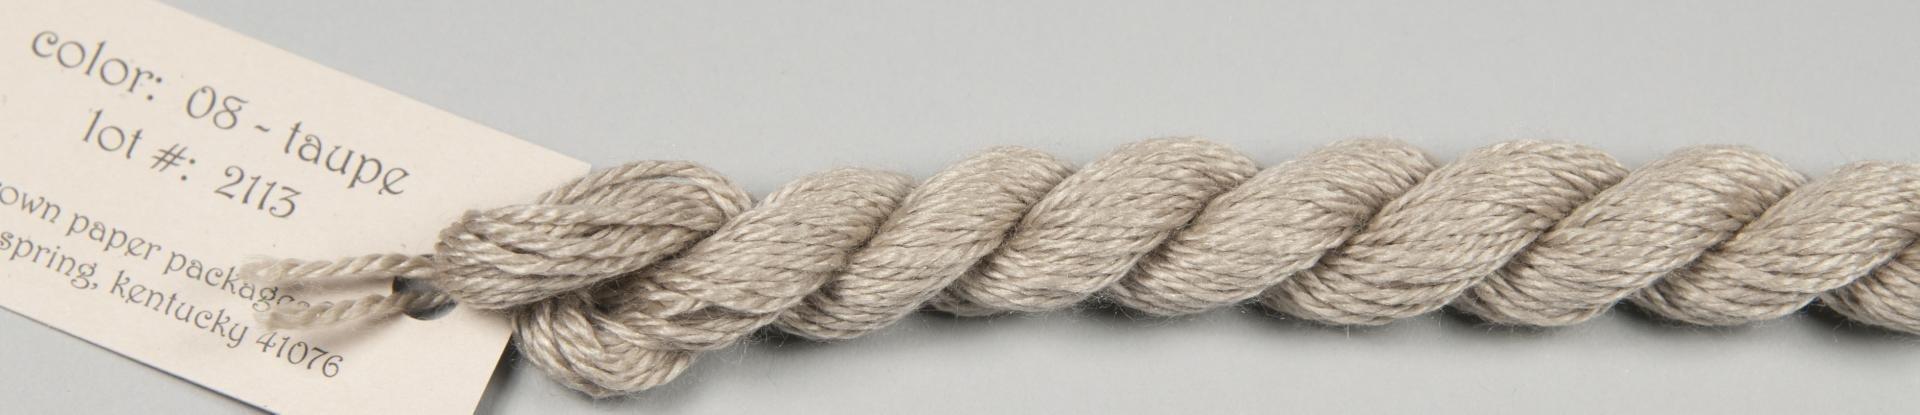 Silk & Ivory 08 TAUPE